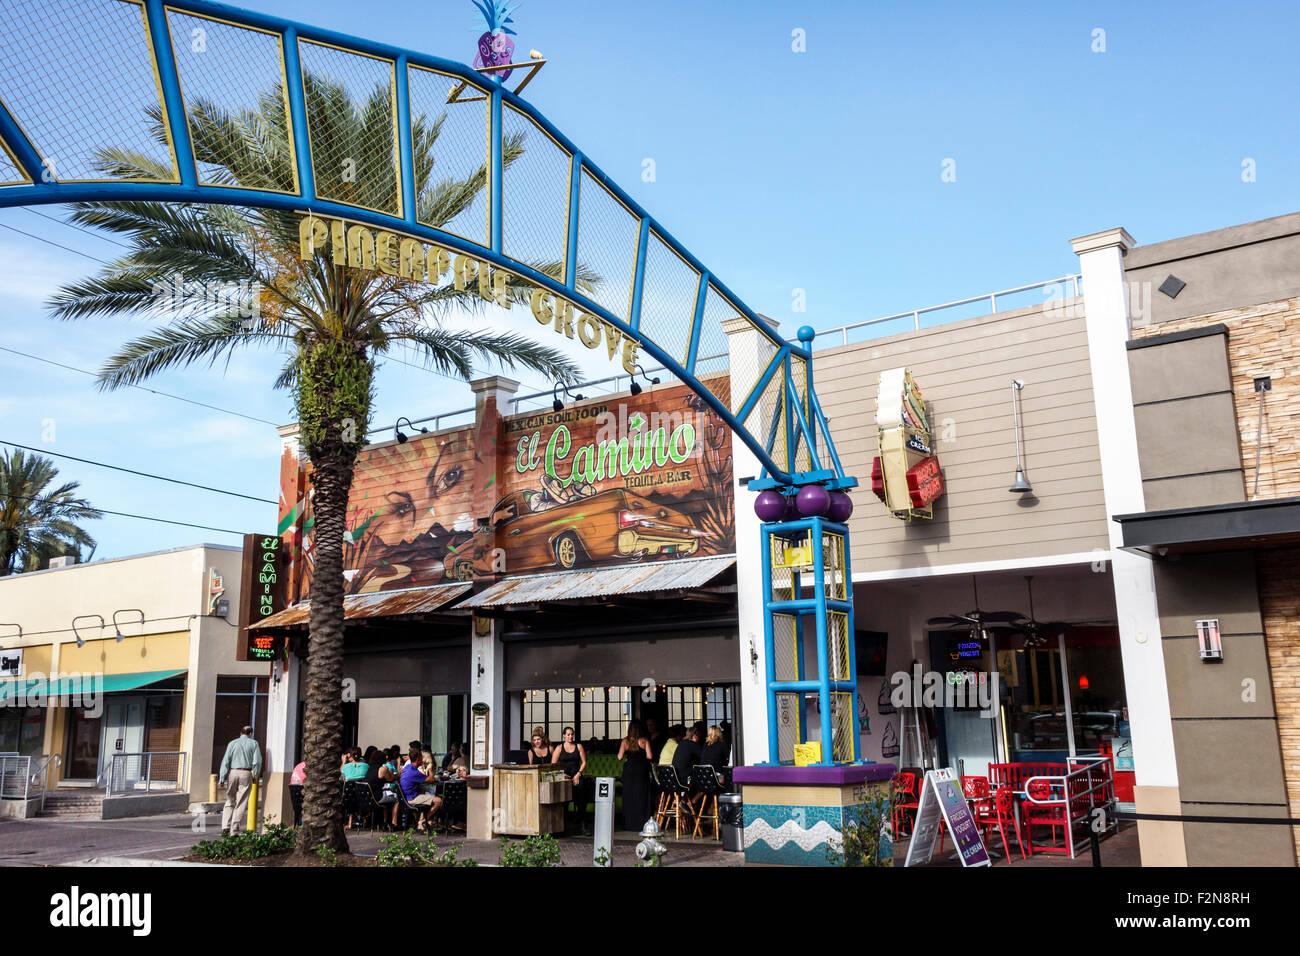 Florida FL South Delray Beach Pineapple Grove Arts District 2nd Avenue El Camino restaurant bar front entrance Stock Photo